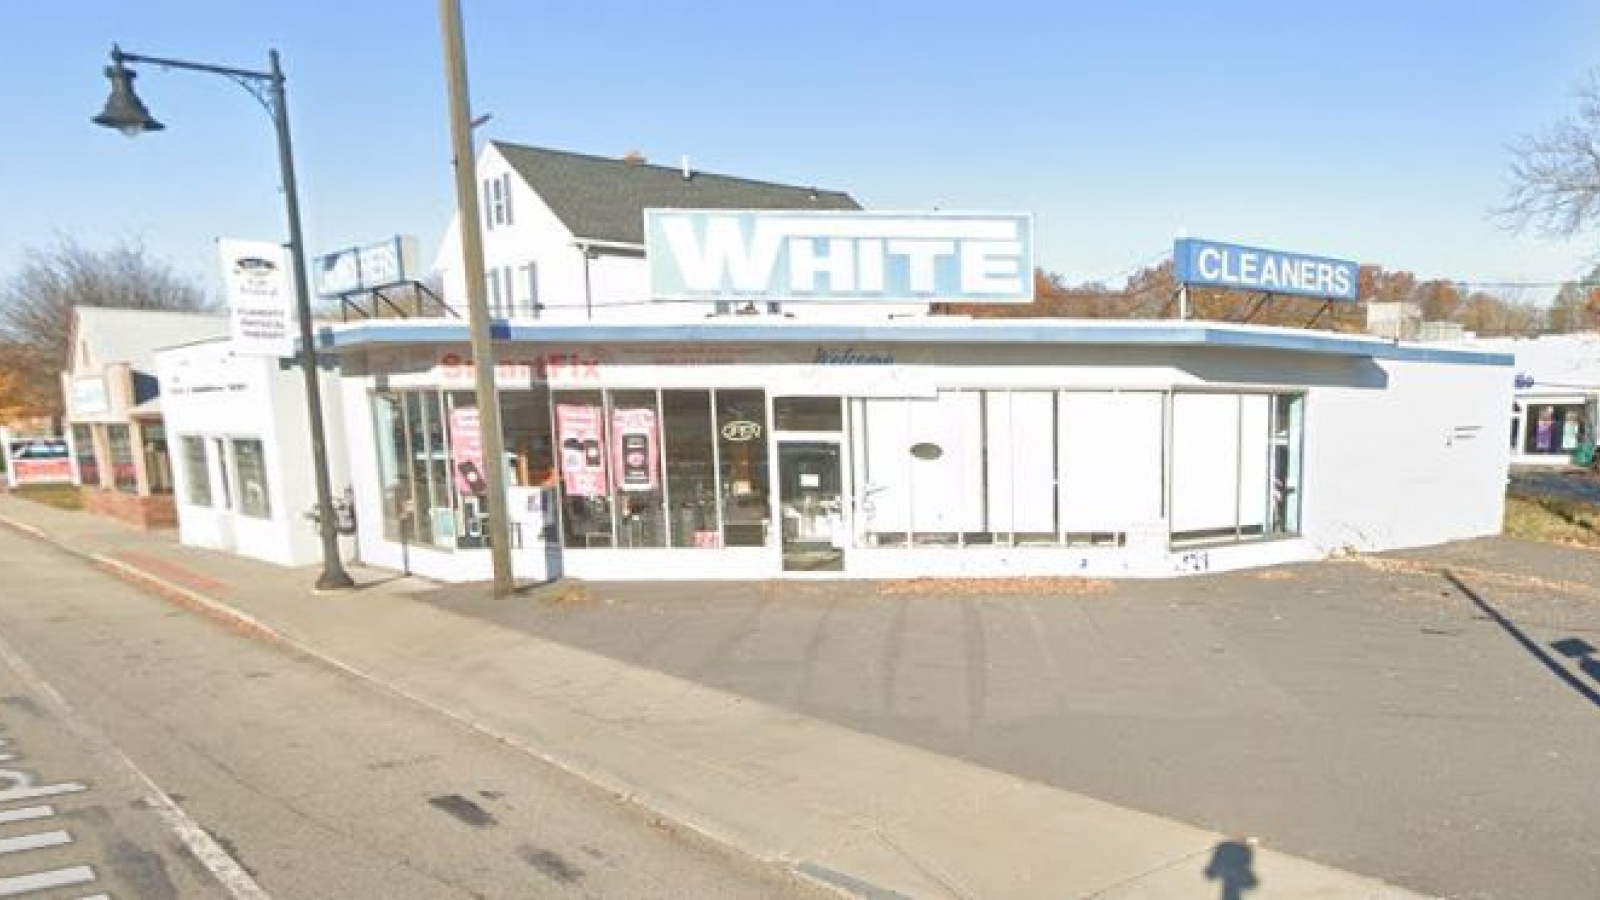 119 Boston Turnpike, Shrewsbury, Massachusetts 01545, Retail / Restaurant,For Sale,Boston Turnpike,1308